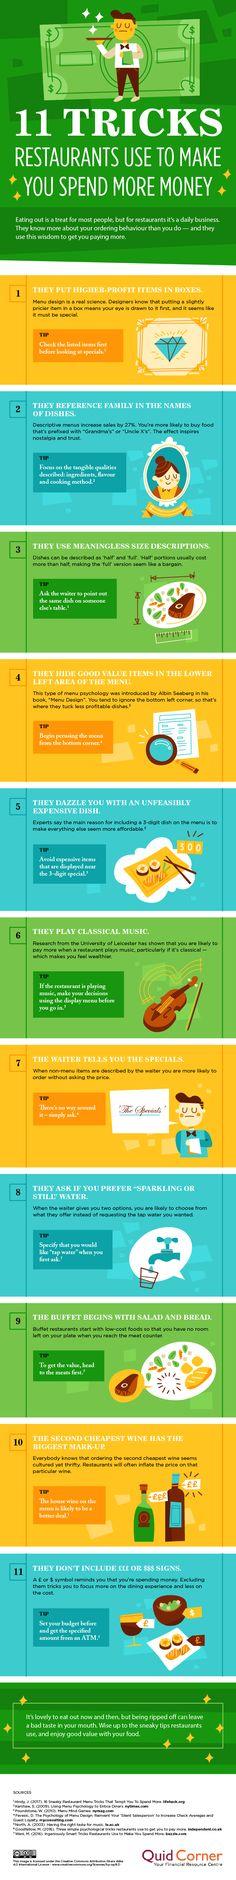 11 Tricks Restaurants Use to Make You Spend More Money #Infographic #Saving #Money